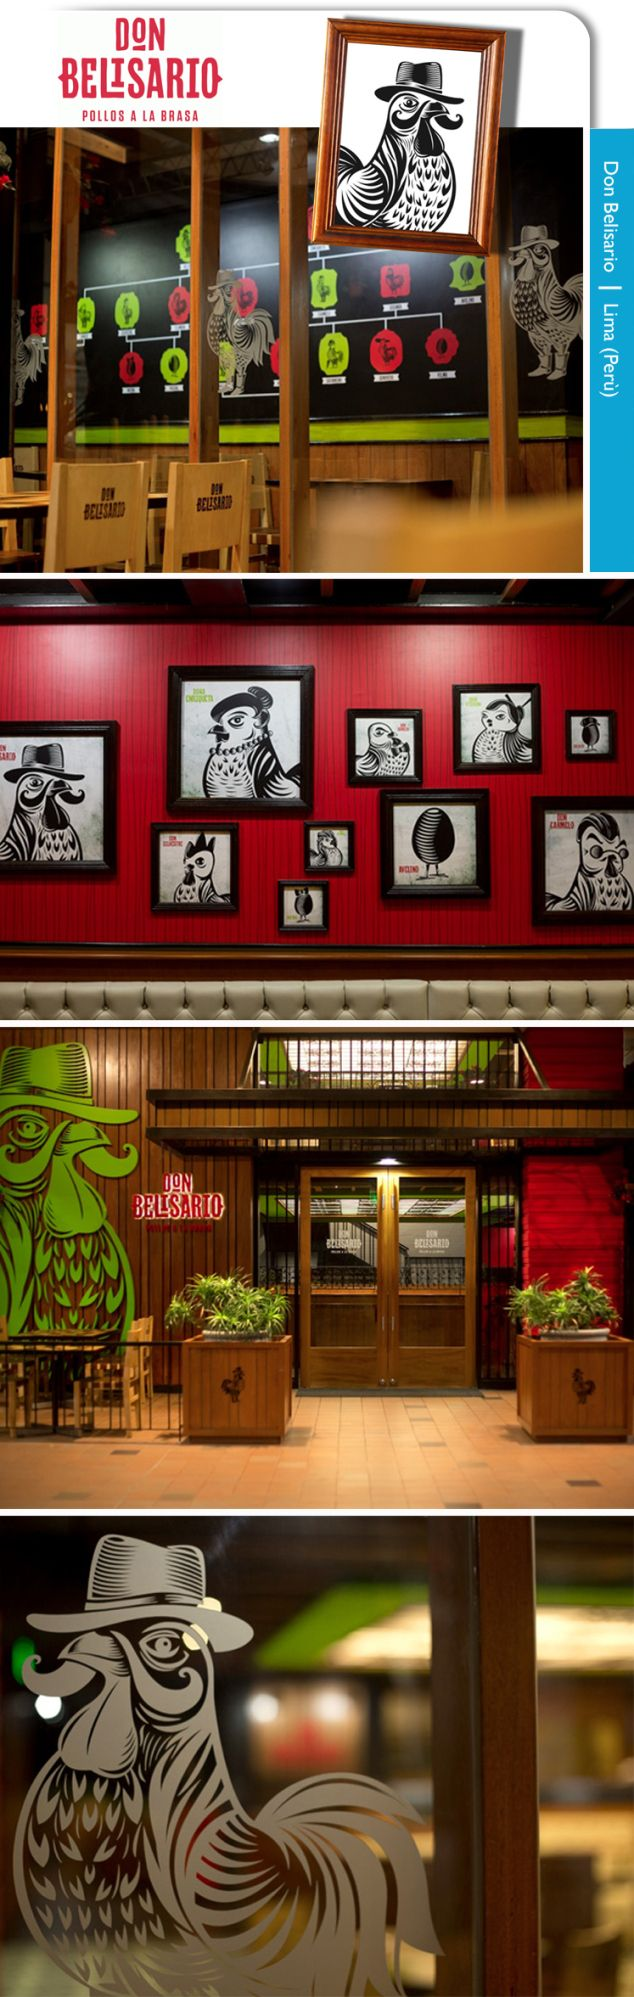 Don Belisario chicken restaurant in Peru. Cute concept!